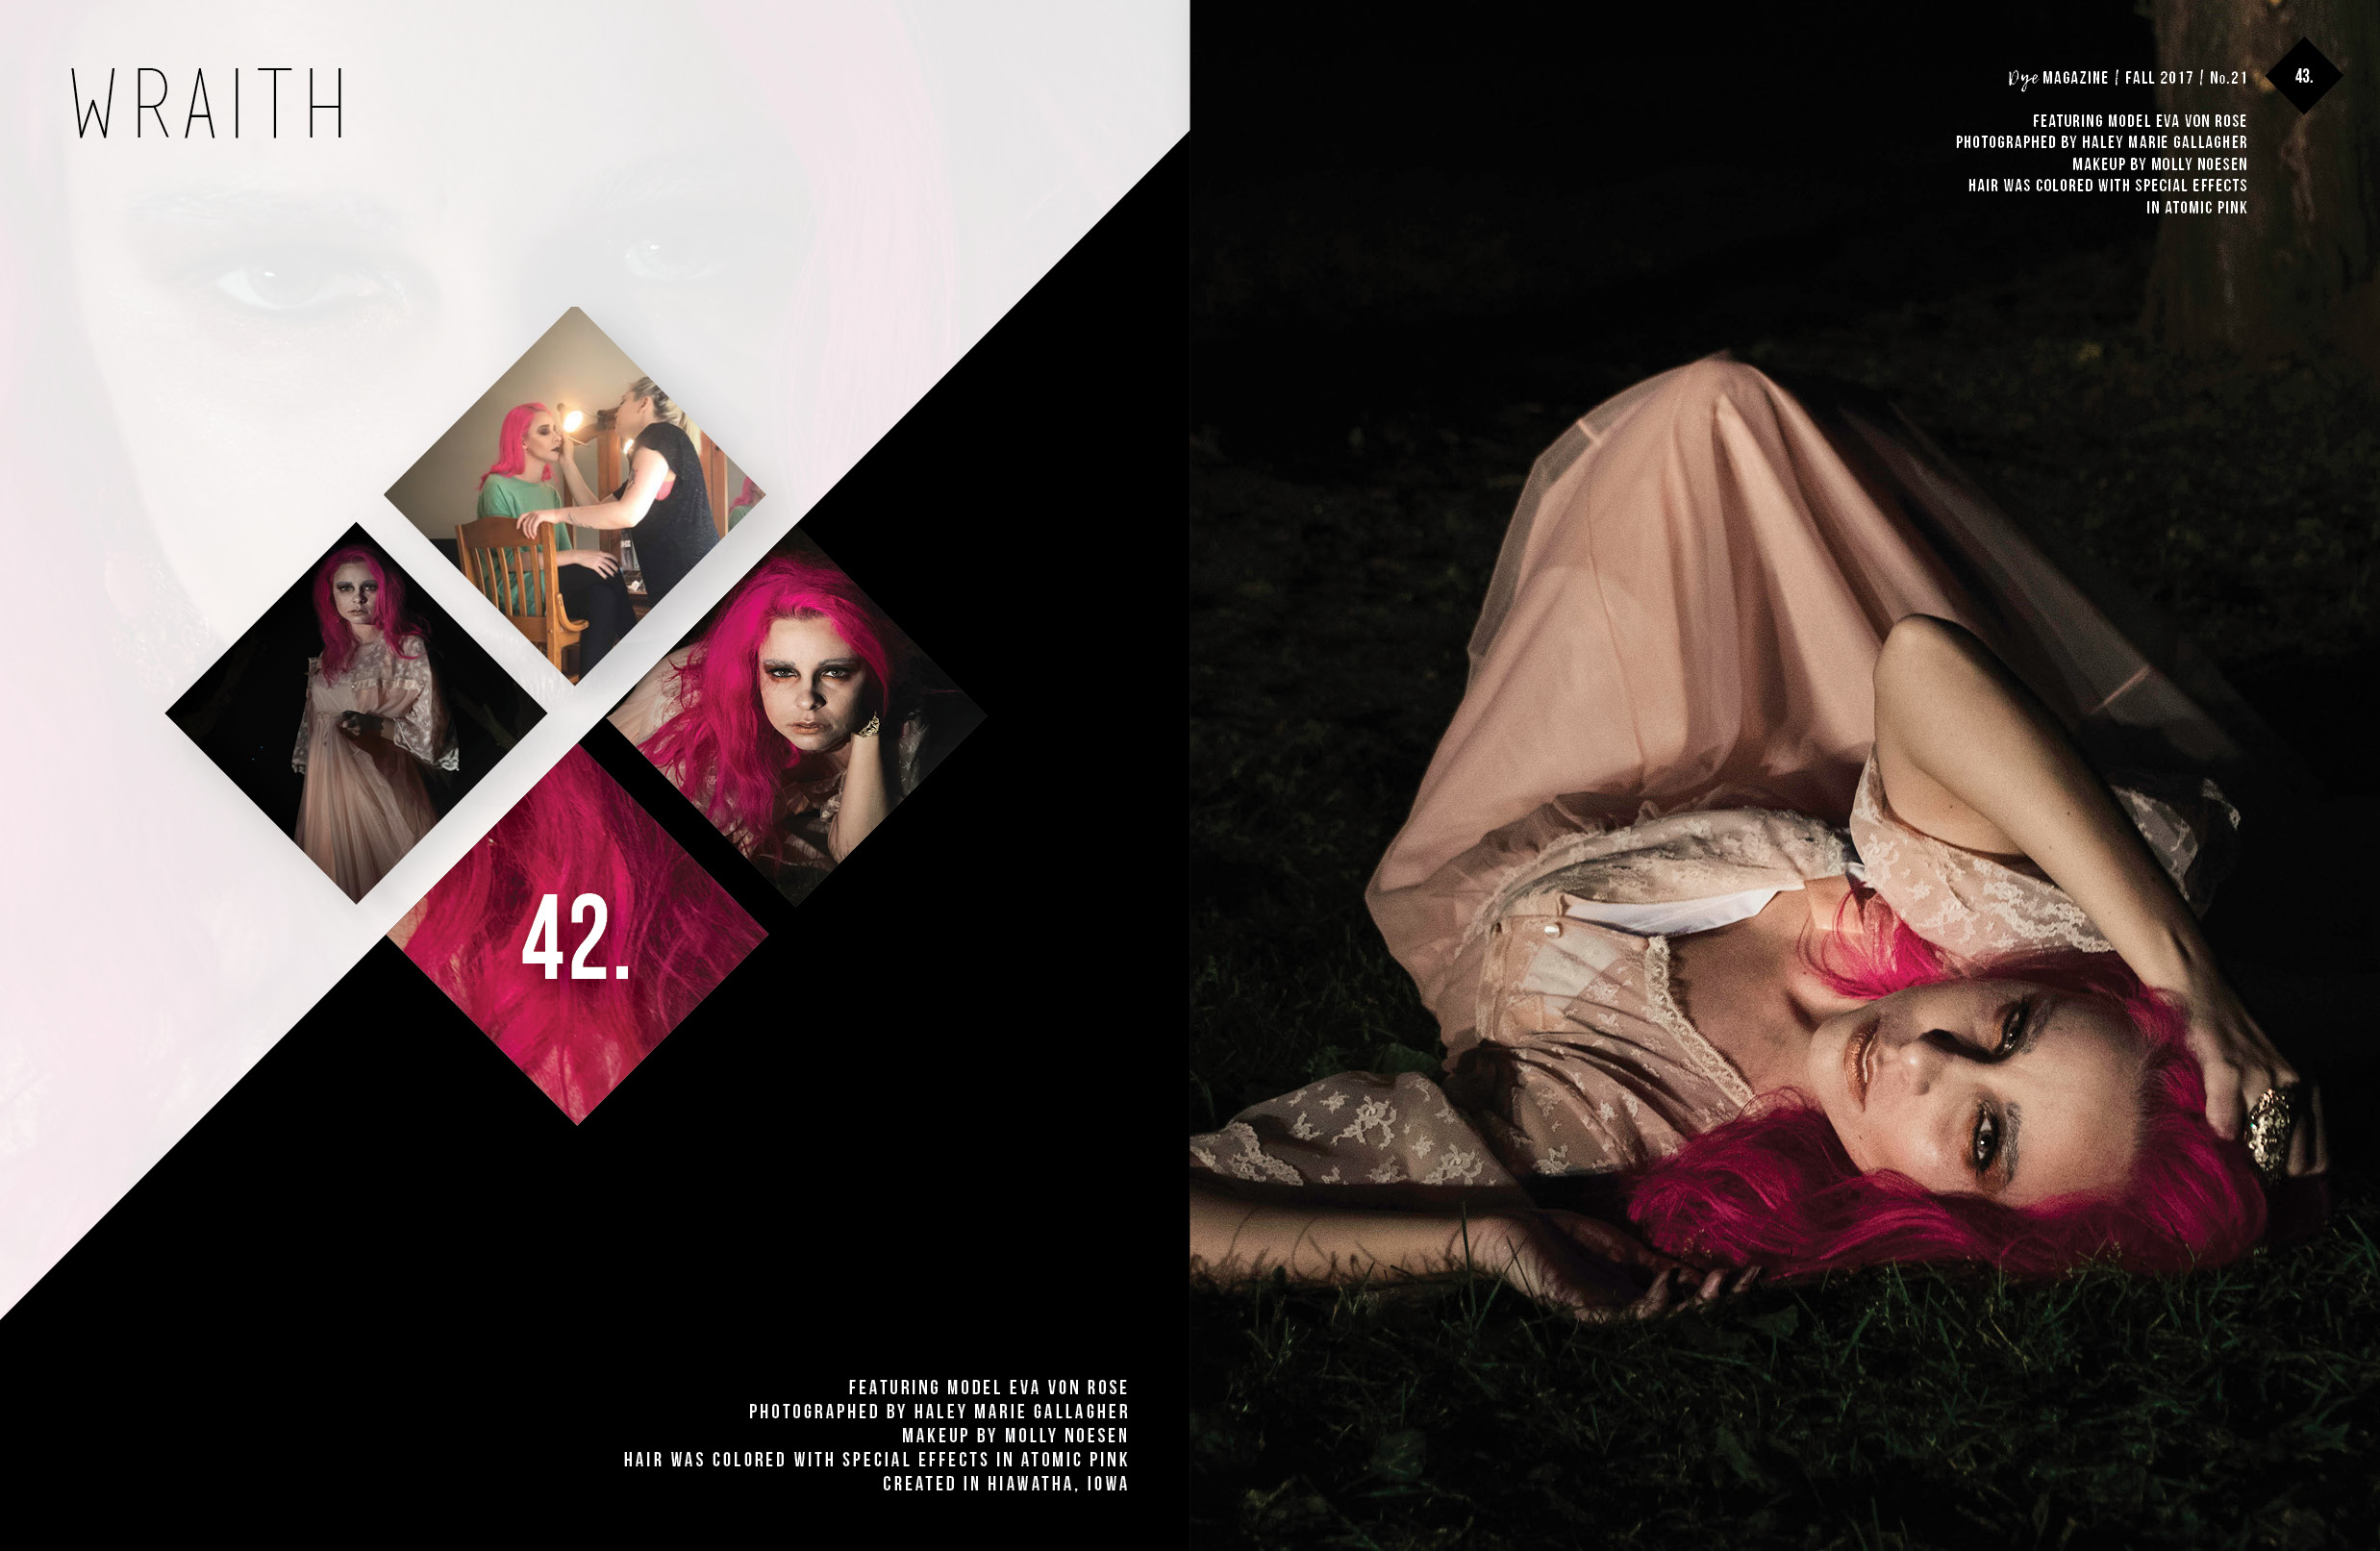 Publication for Dye Magazine, October 2017. Set 'Wraith' with model Eva Von Rose and Makeup Artist Molly Noesen